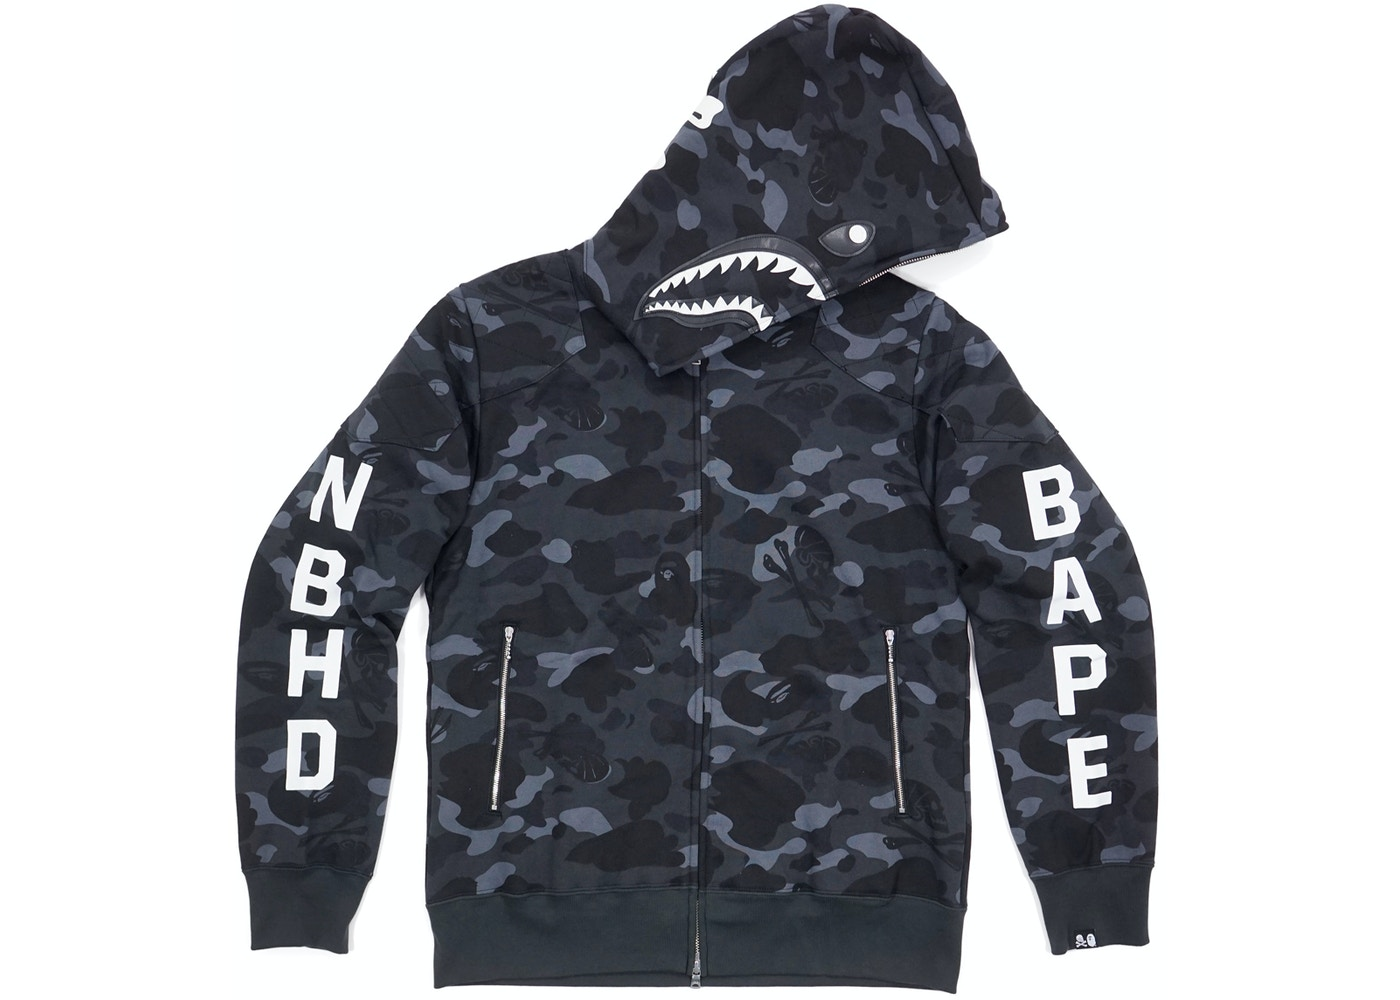 8c19c65ec277 Streetwear - Bape Tops Sweatshirts - Highest Bid